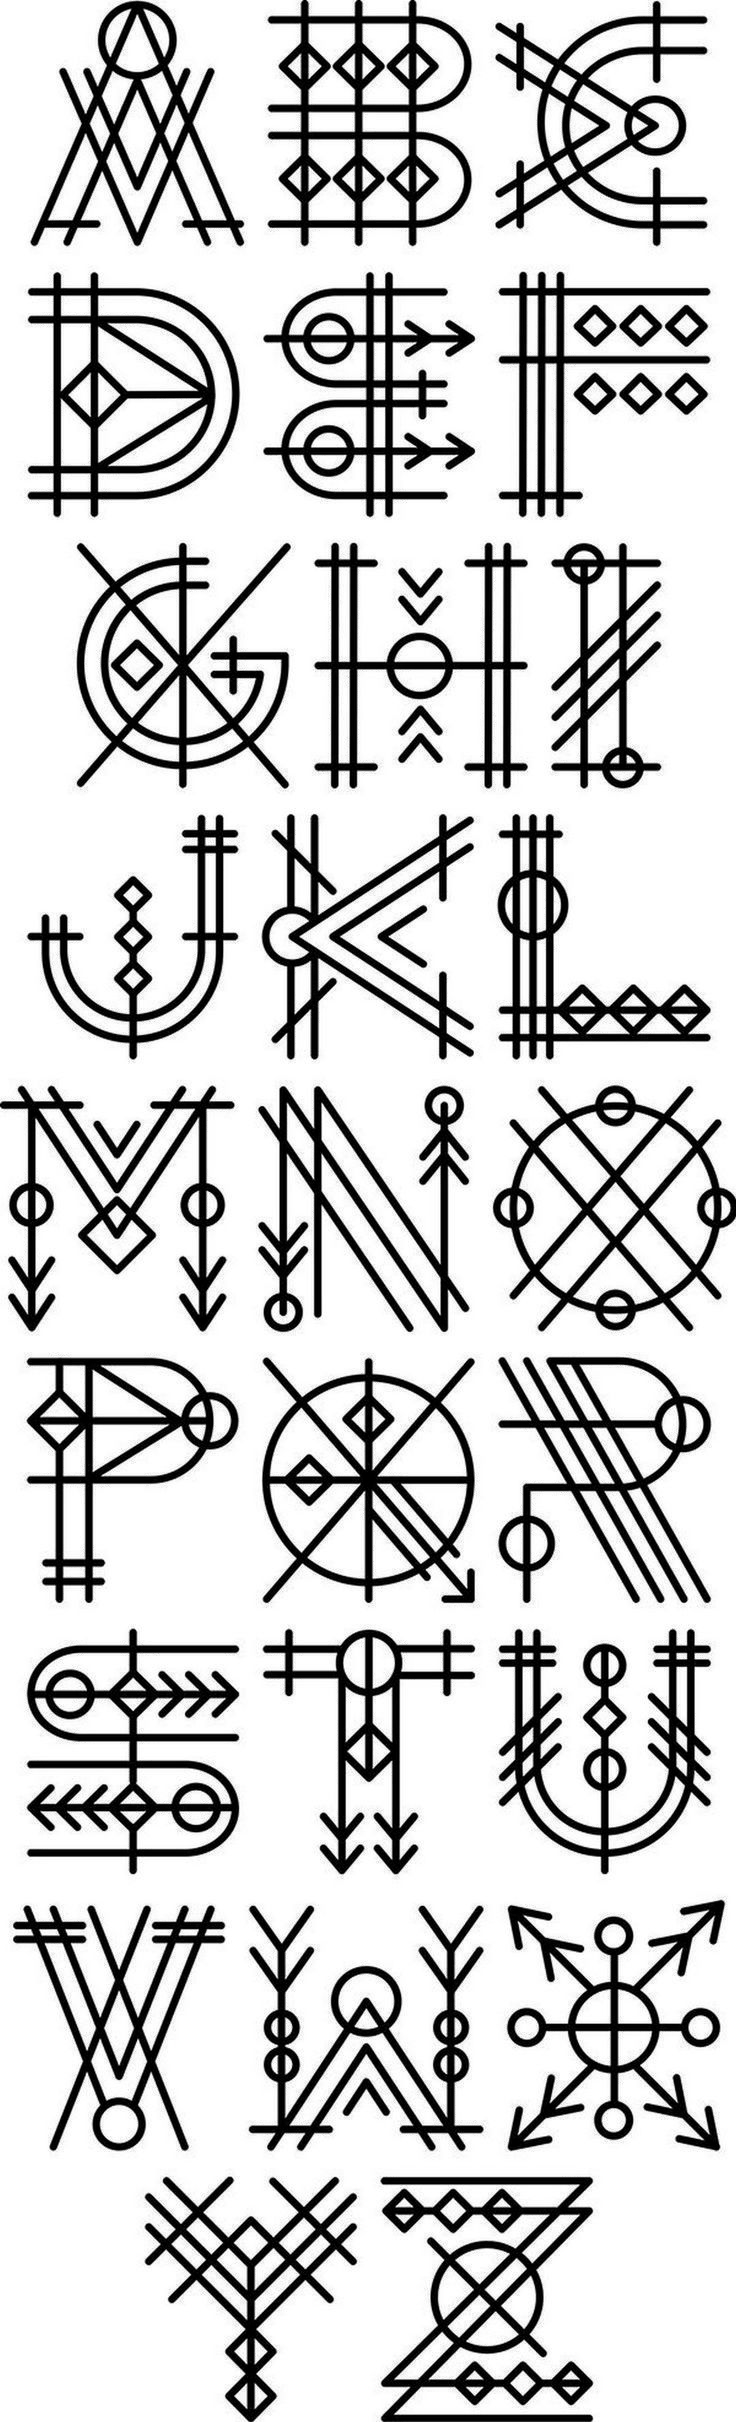 90 Beautiful Typography Alphabet Designs (Part 2) www.designlisticl … #alphabet #designlisticl #designs #typography